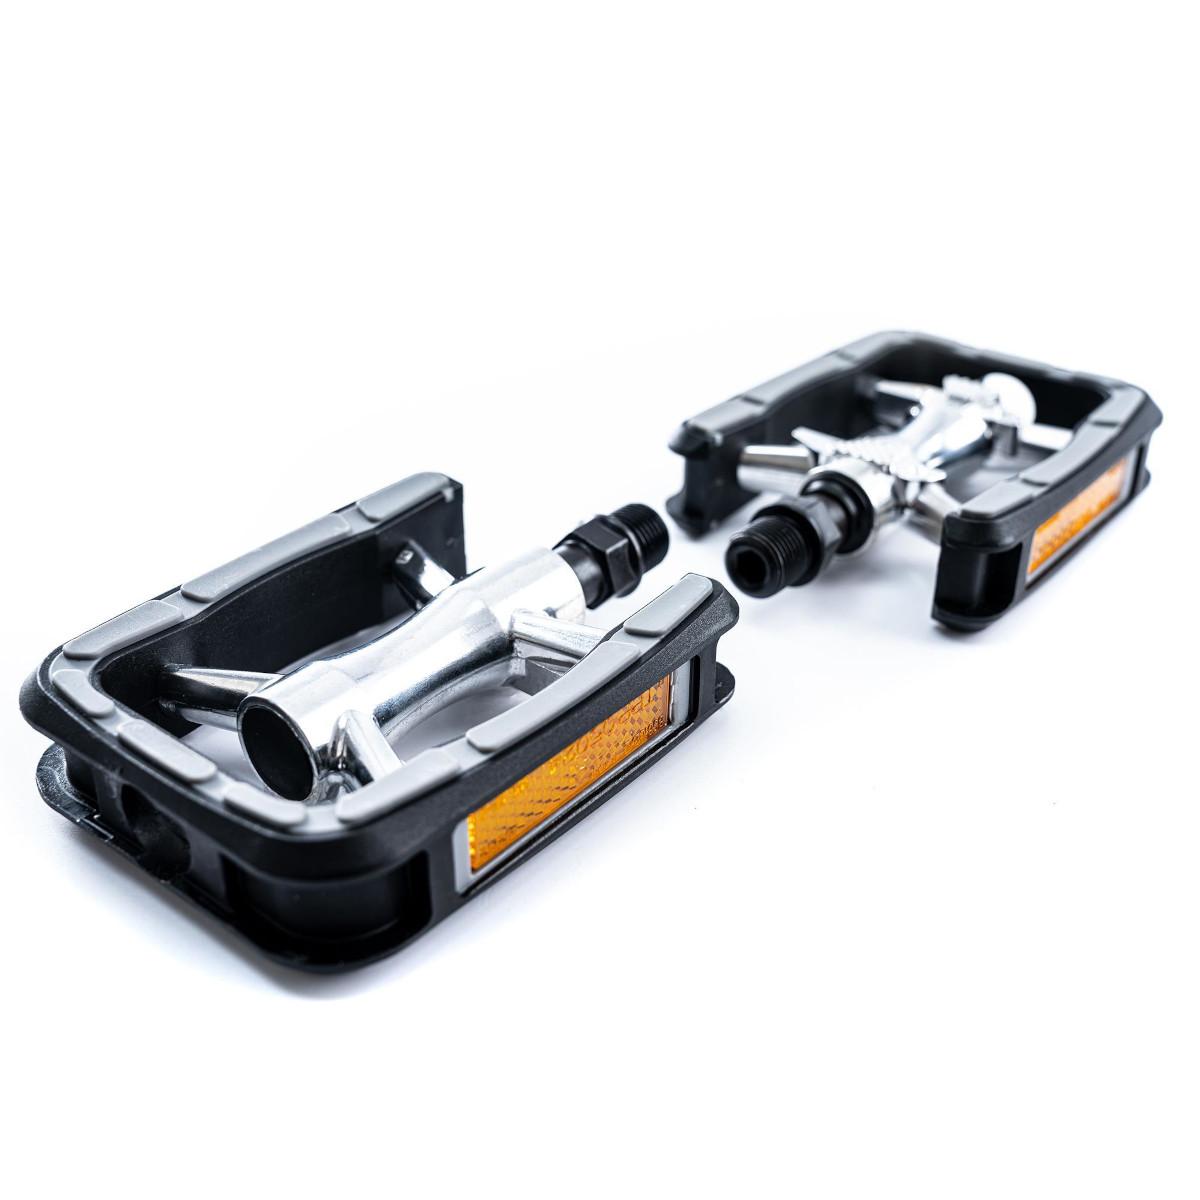 RFR Pedals Comfort CMPT